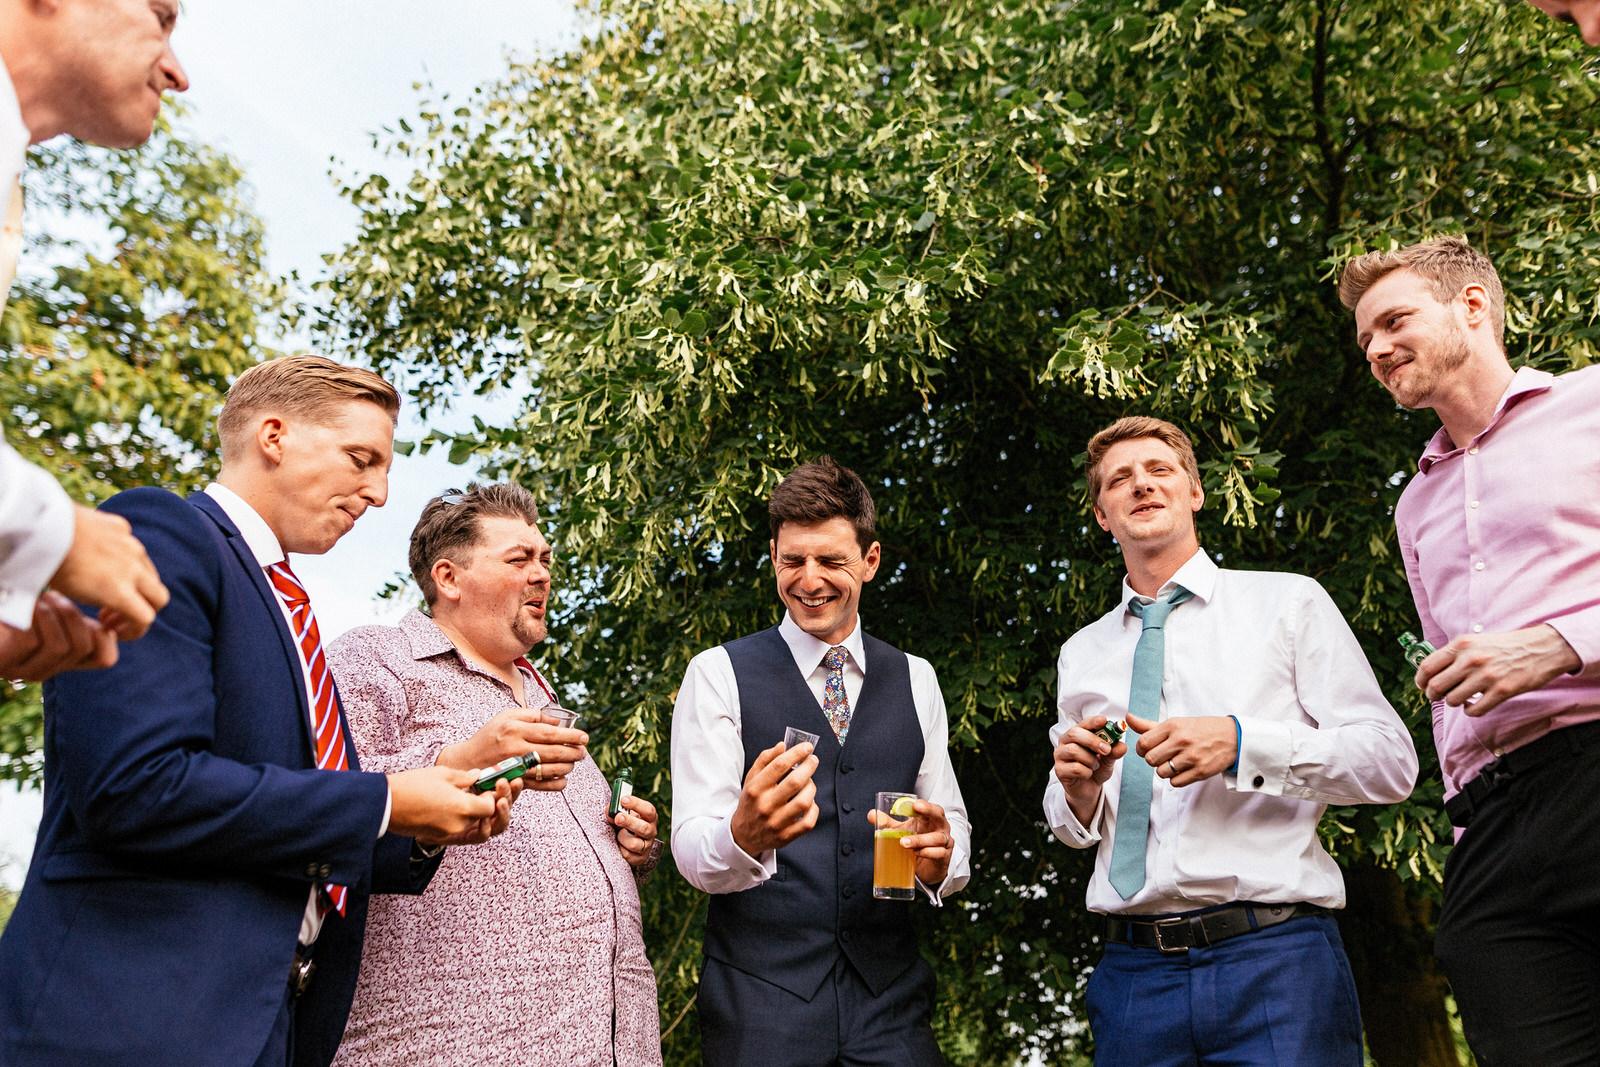 Edworth-Manor-Farm-Wedding-Photographer-067.jpg